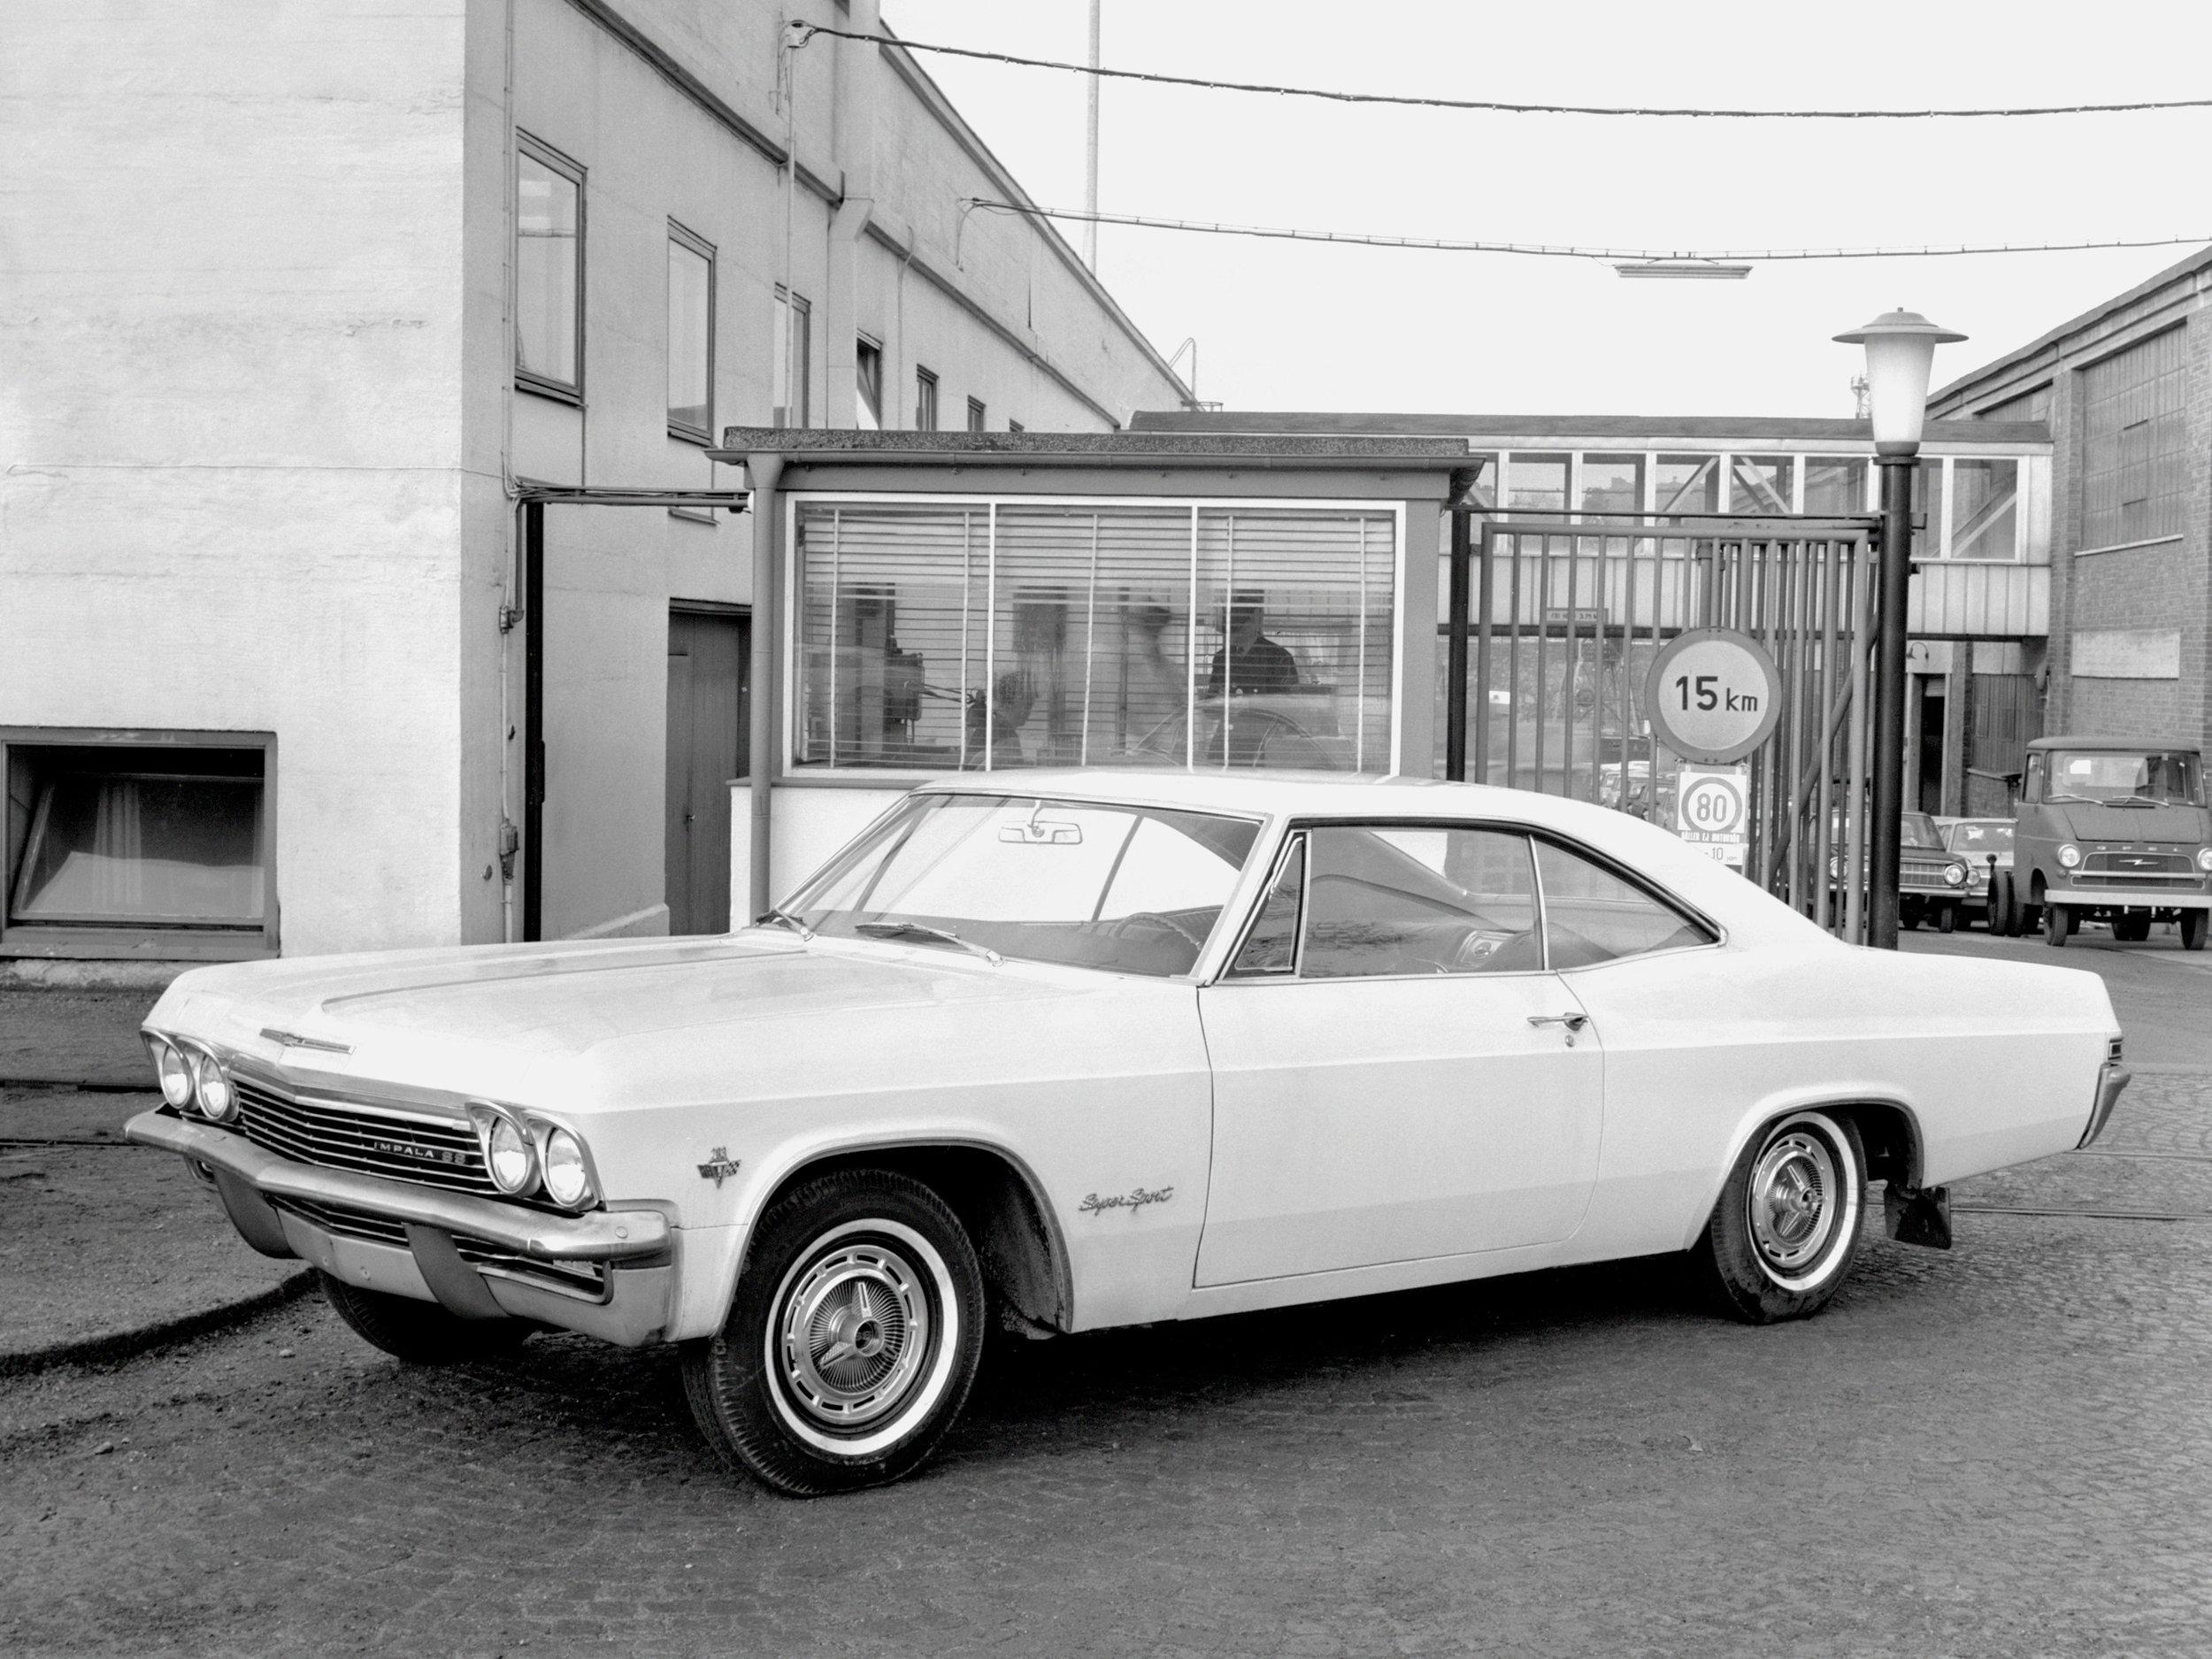 1965-chevrolet_impala-01.jpeg